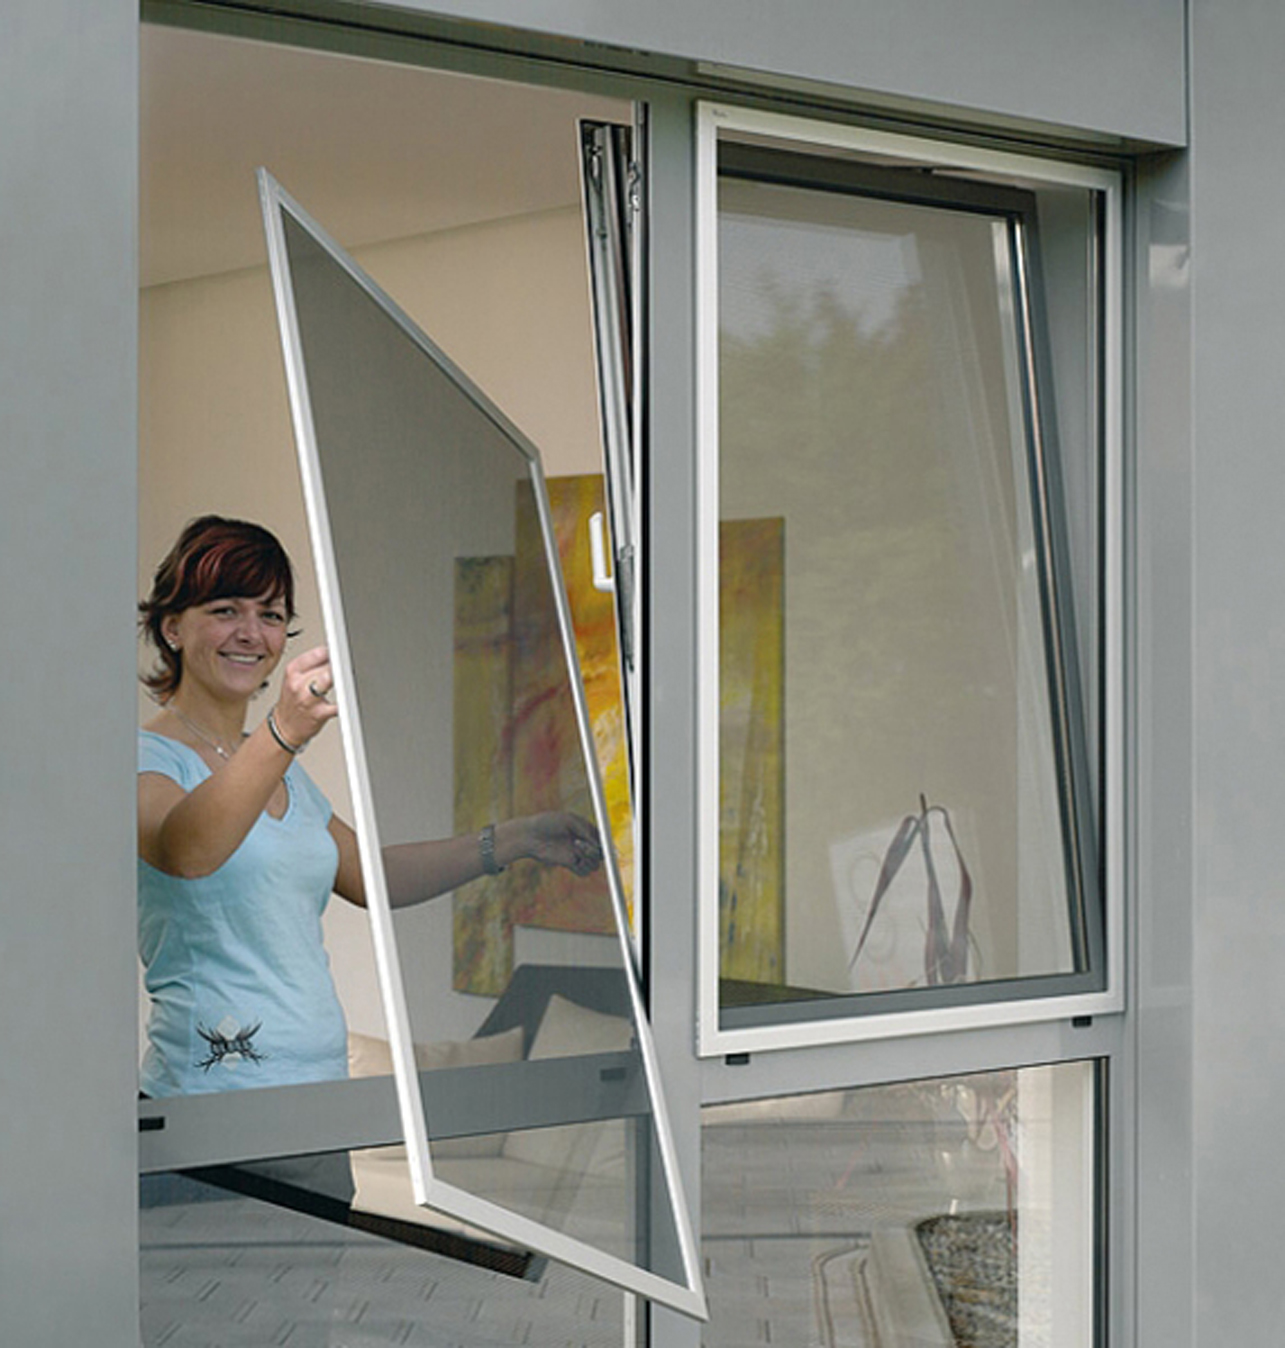 Фото снятое через окно 1 фотография